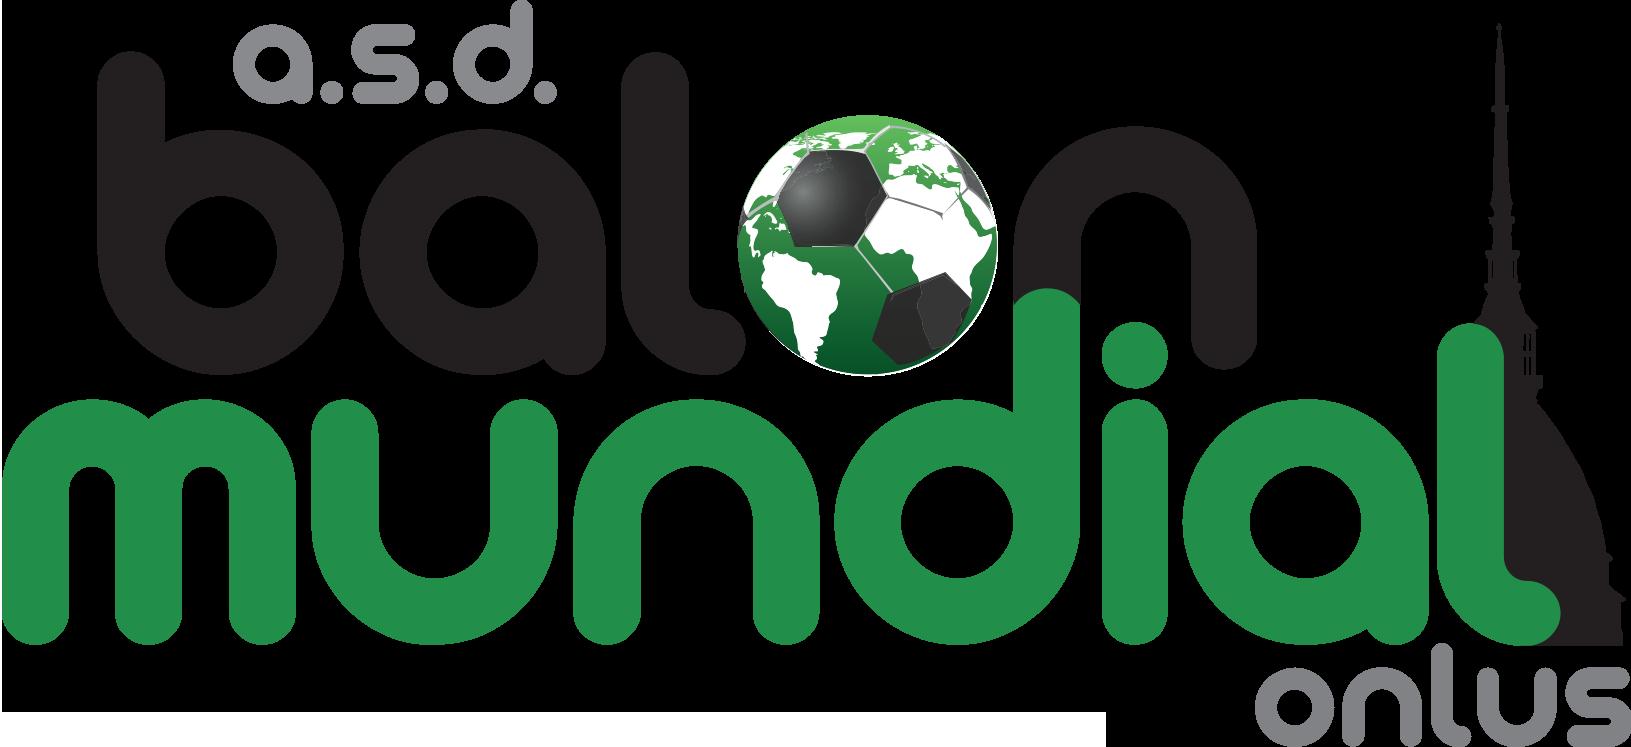 logo_balon mundial